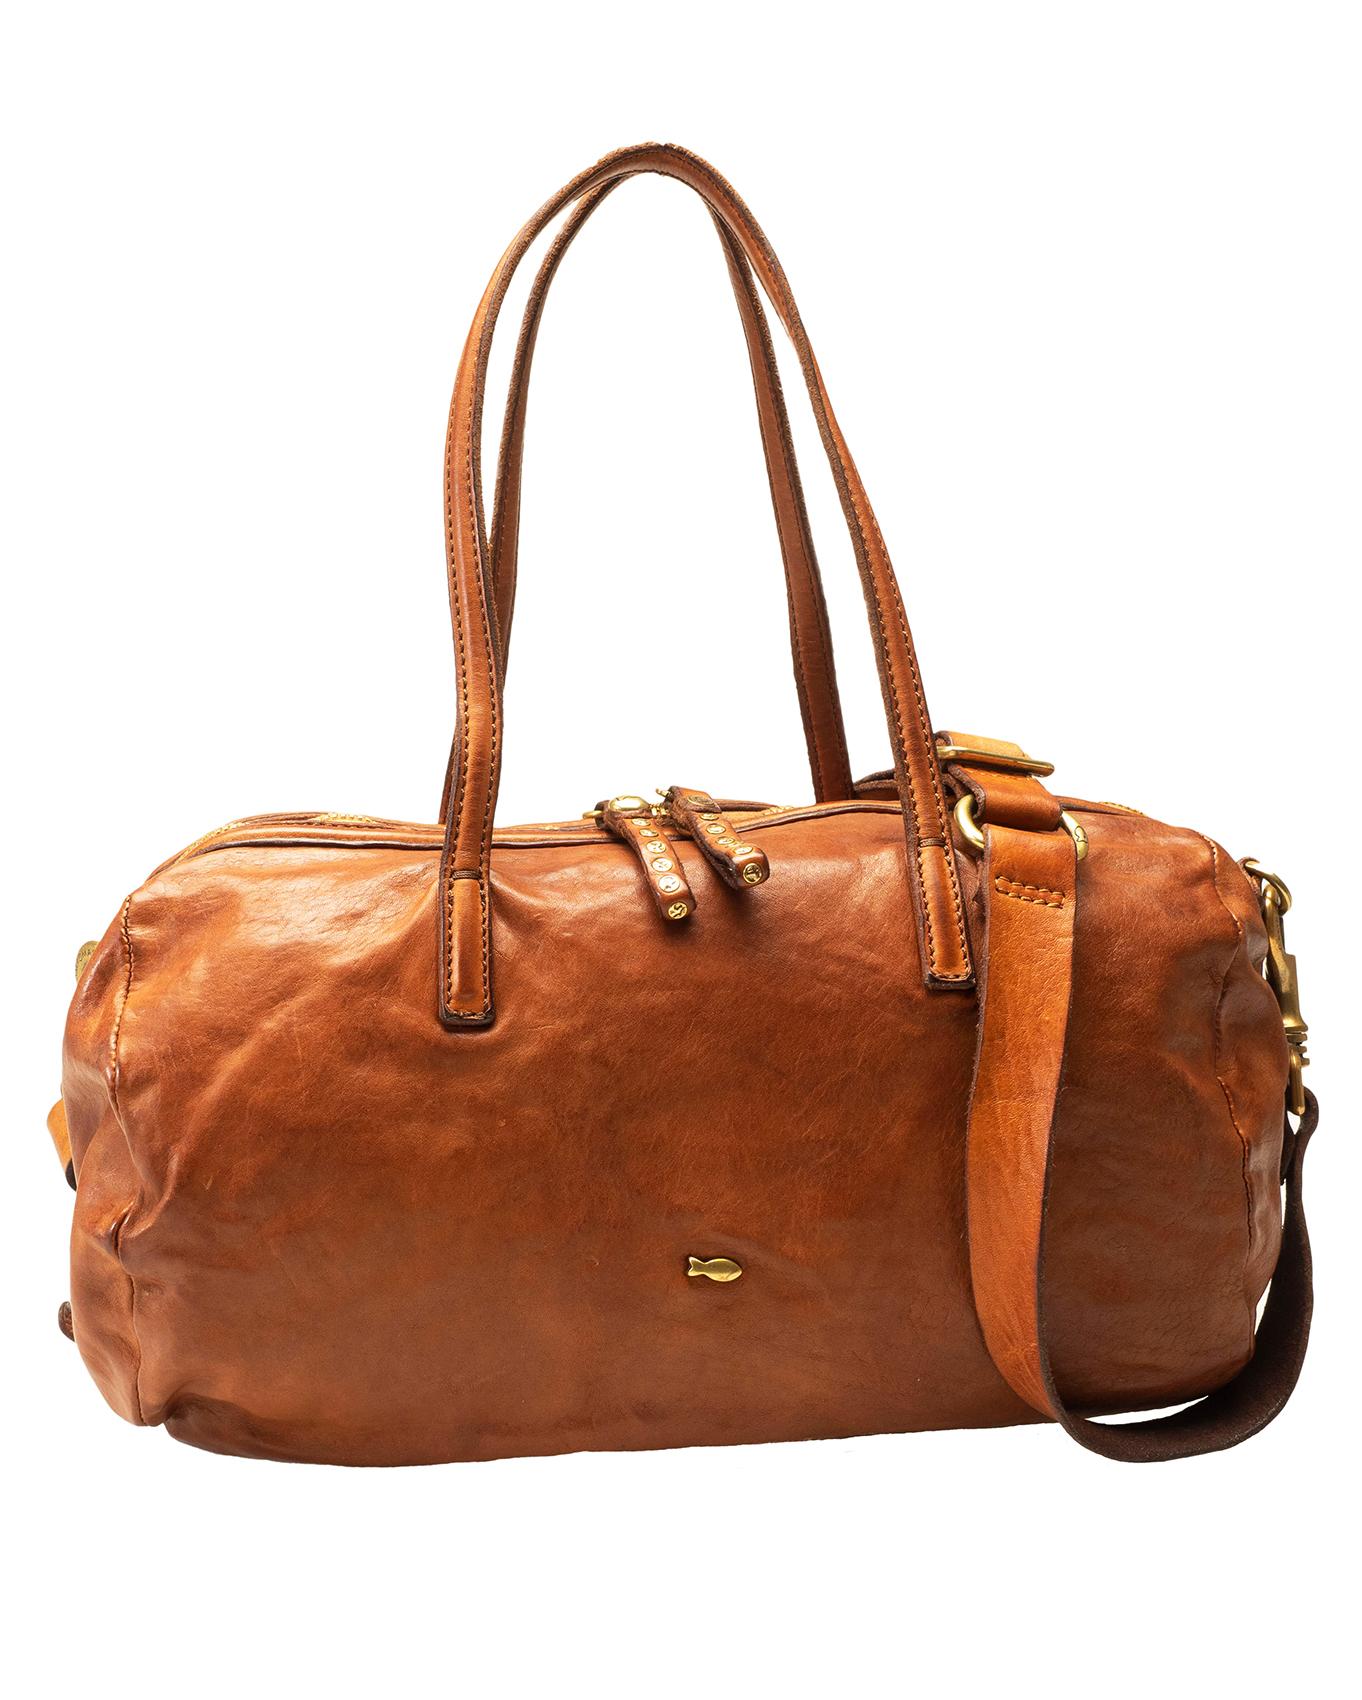 più recente d6d8c 31d01 Bag Bauletto Grande C1502